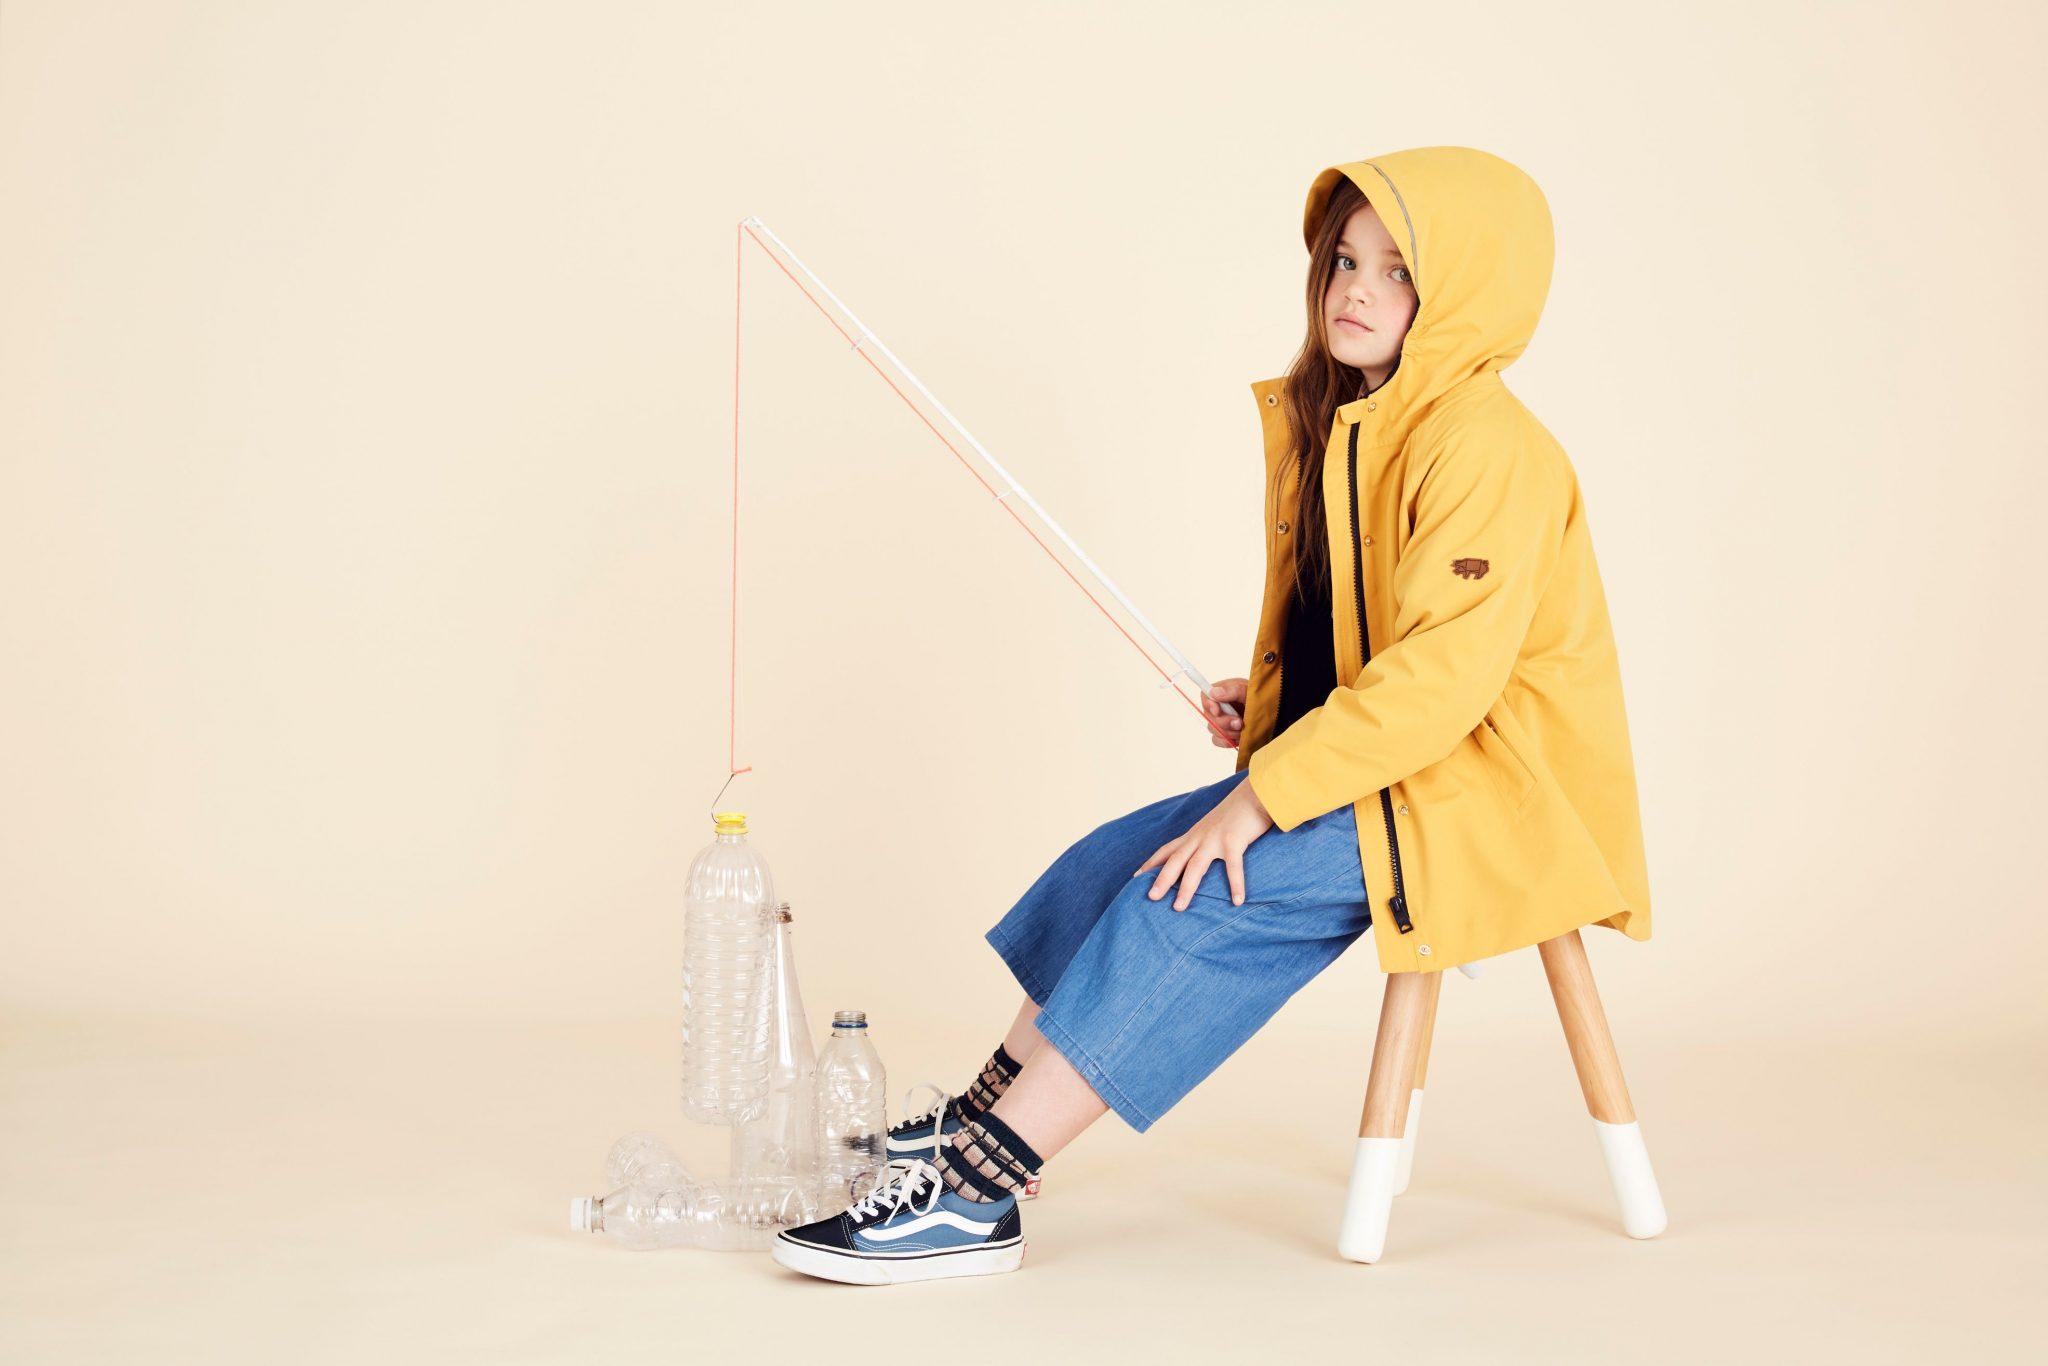 Lifestyle_Fisherman_Yellow_Raincoat